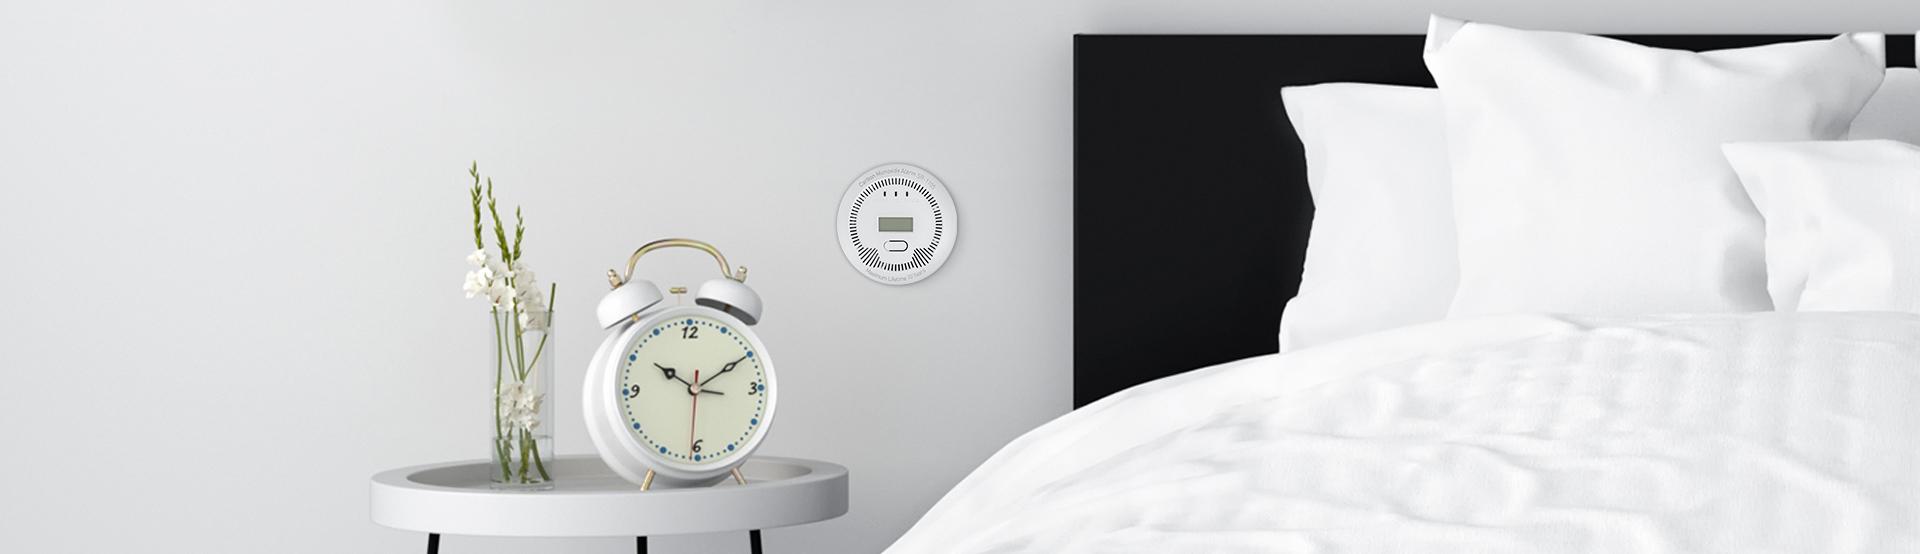 co (carbon monoxide) detector lanberg indoor +bulit-in thermometer 3